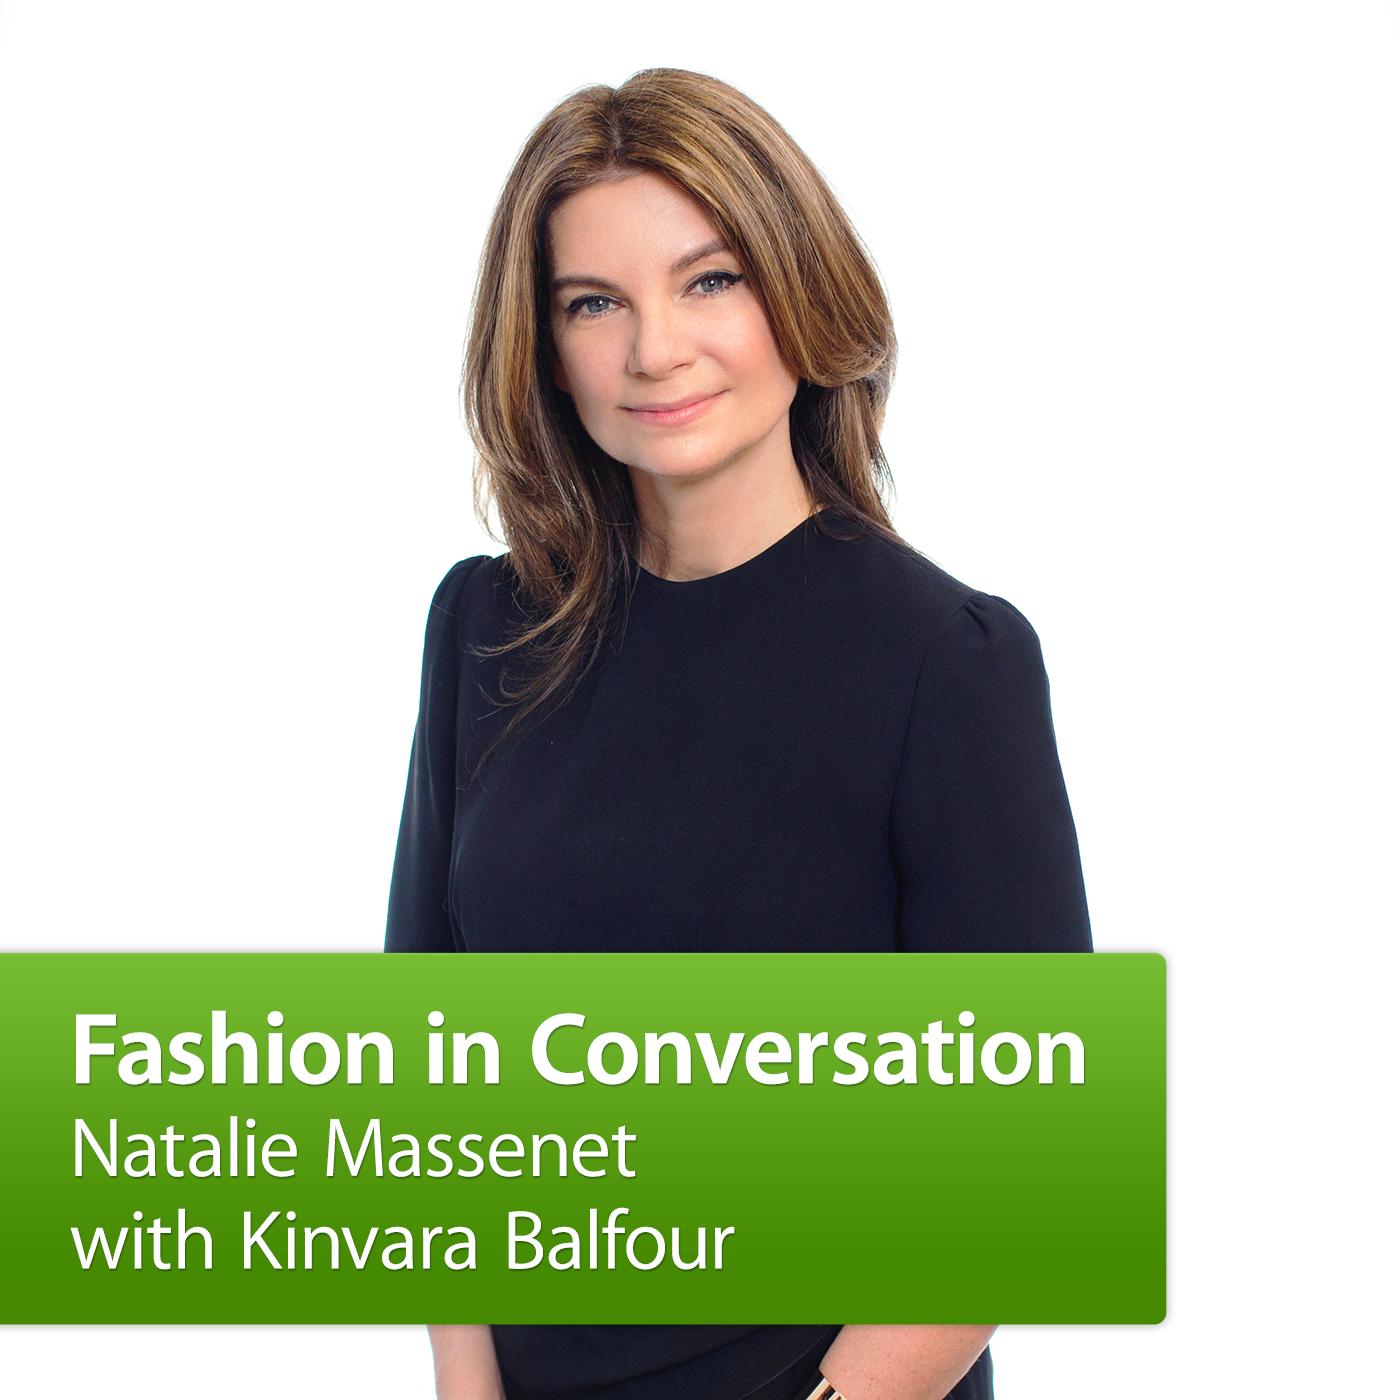 Natalie Massenet with Kinvara Balfour